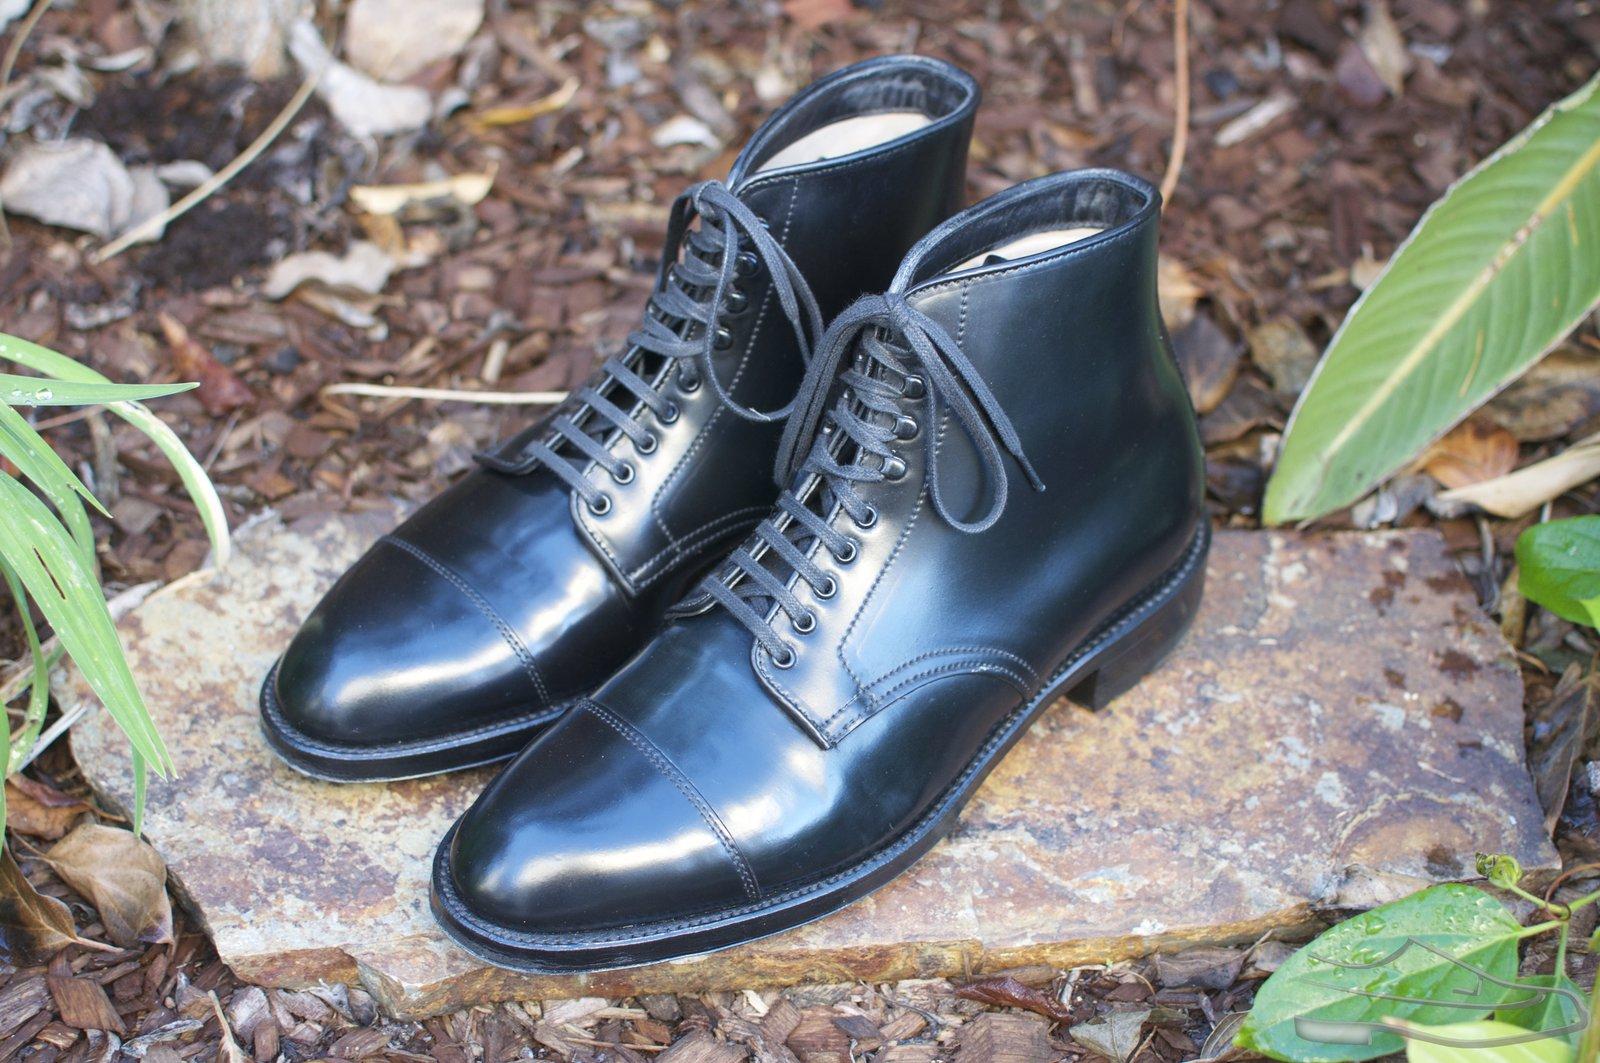 Alden Black Shell Cordovan CT Boots - 2021-04-07 - 1.jpg